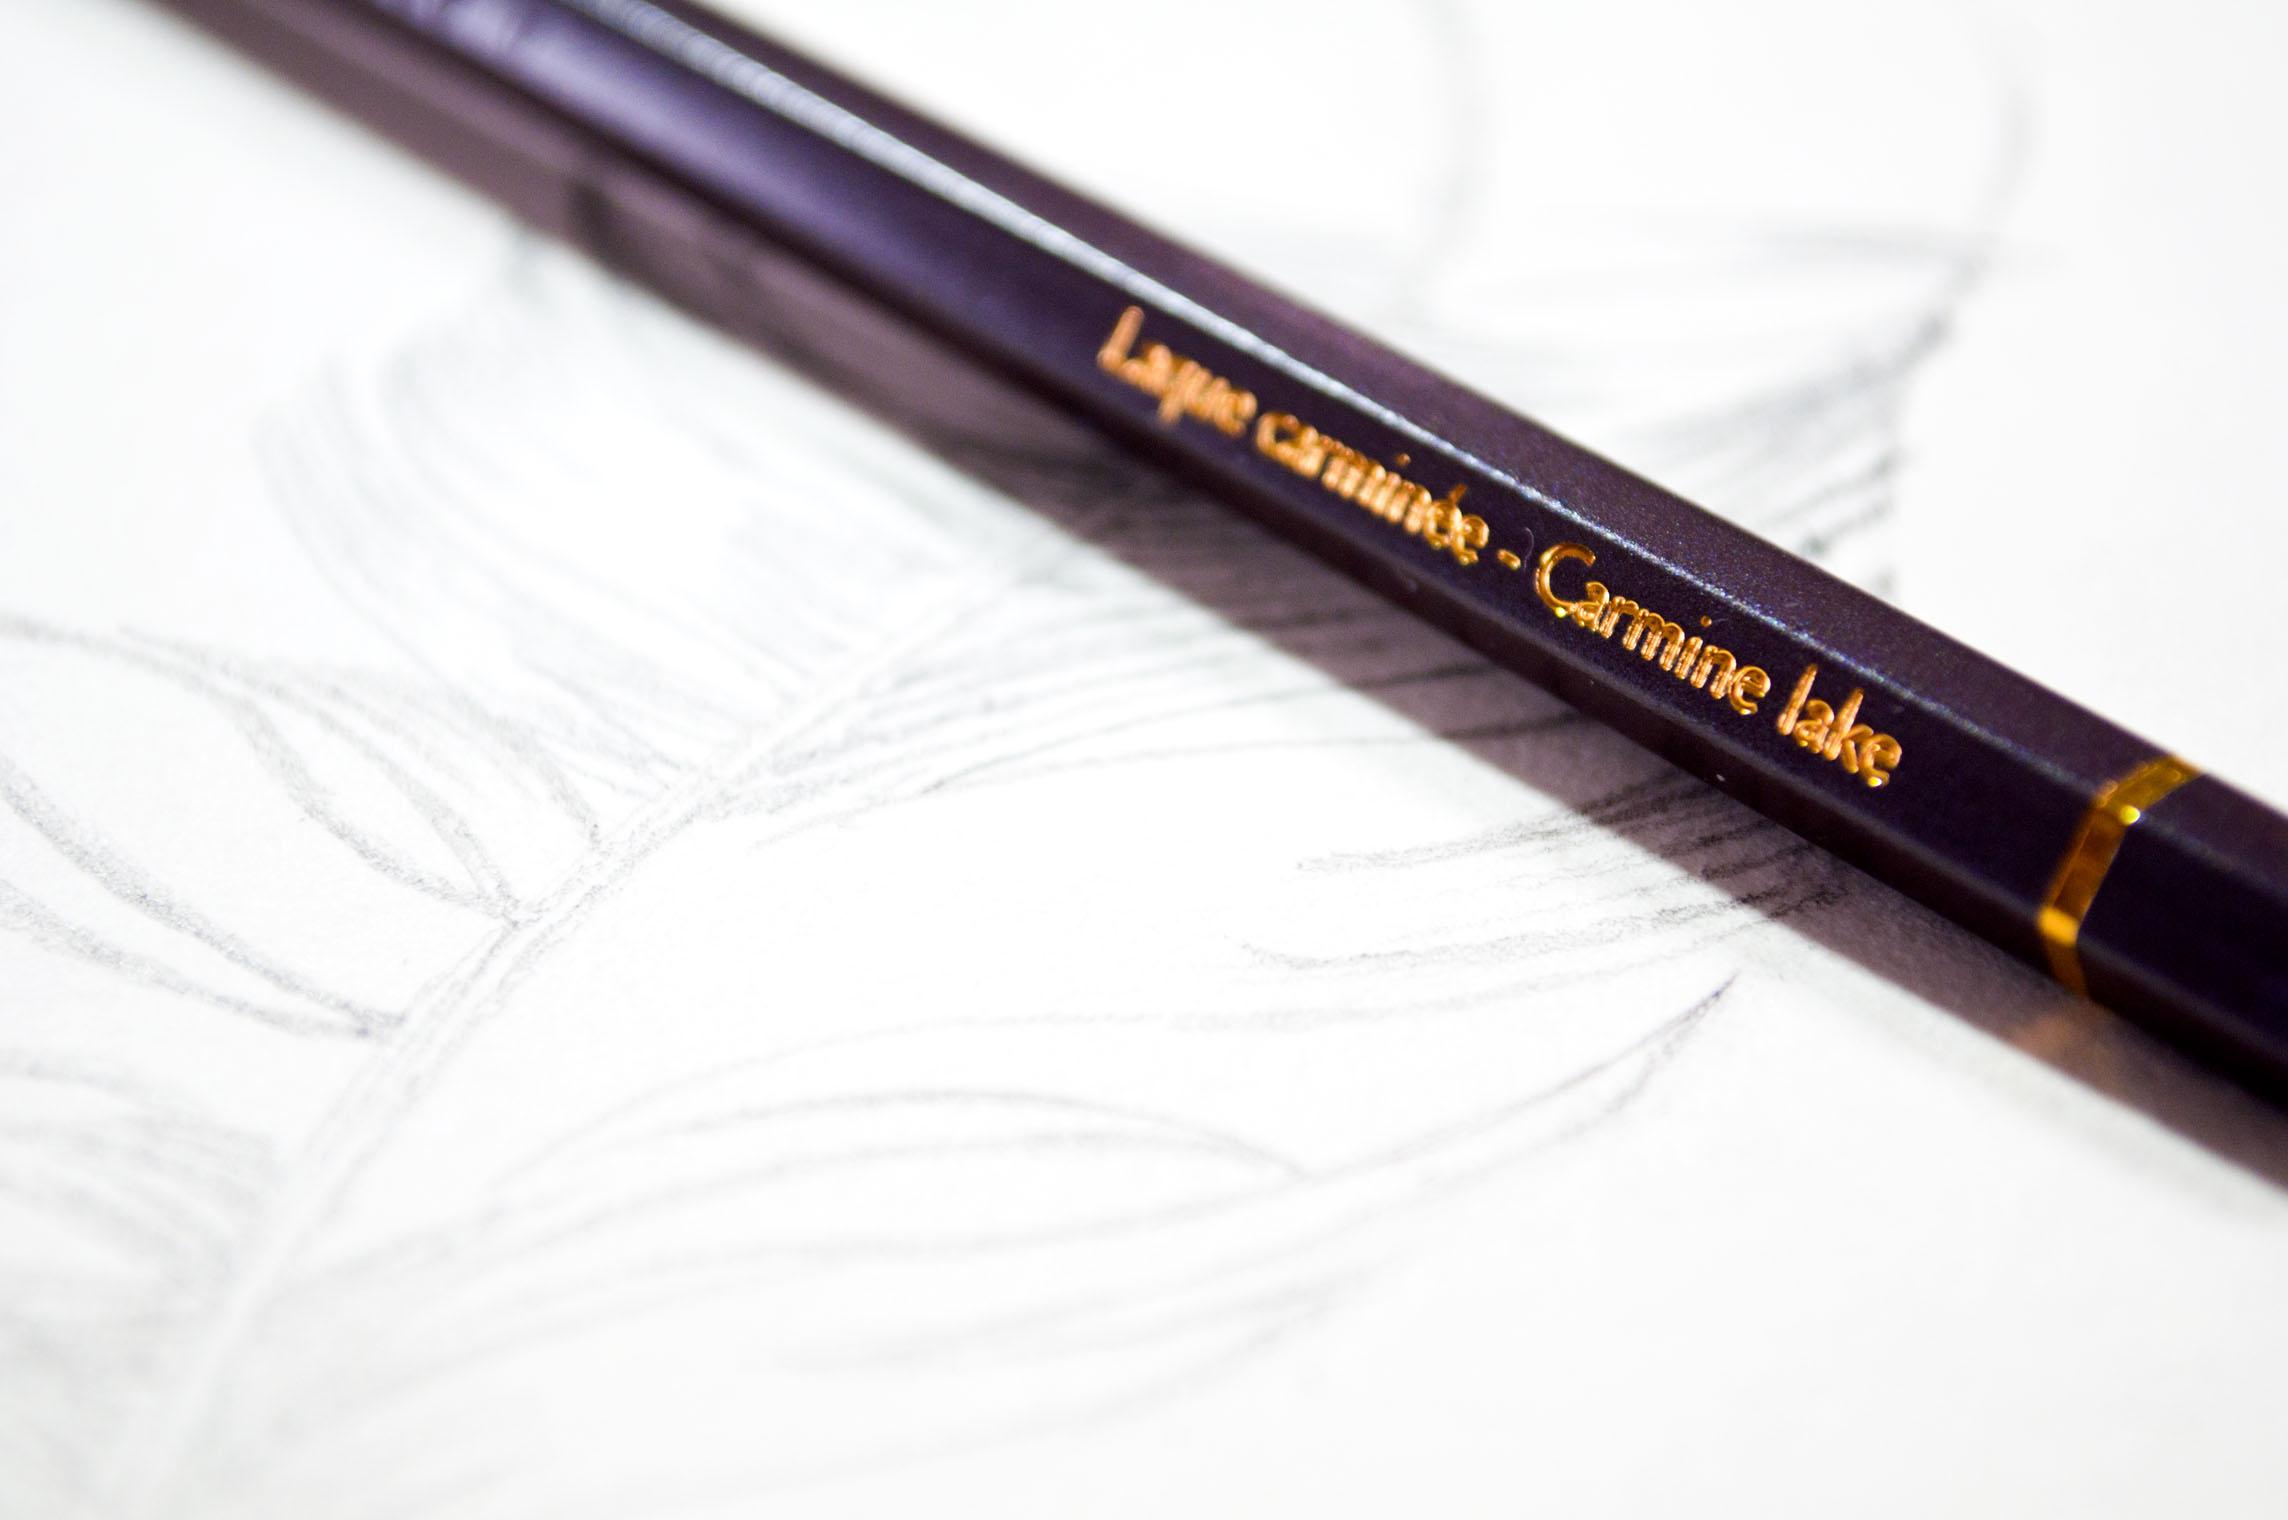 Caran Dache Feather Red Pencil.jpg